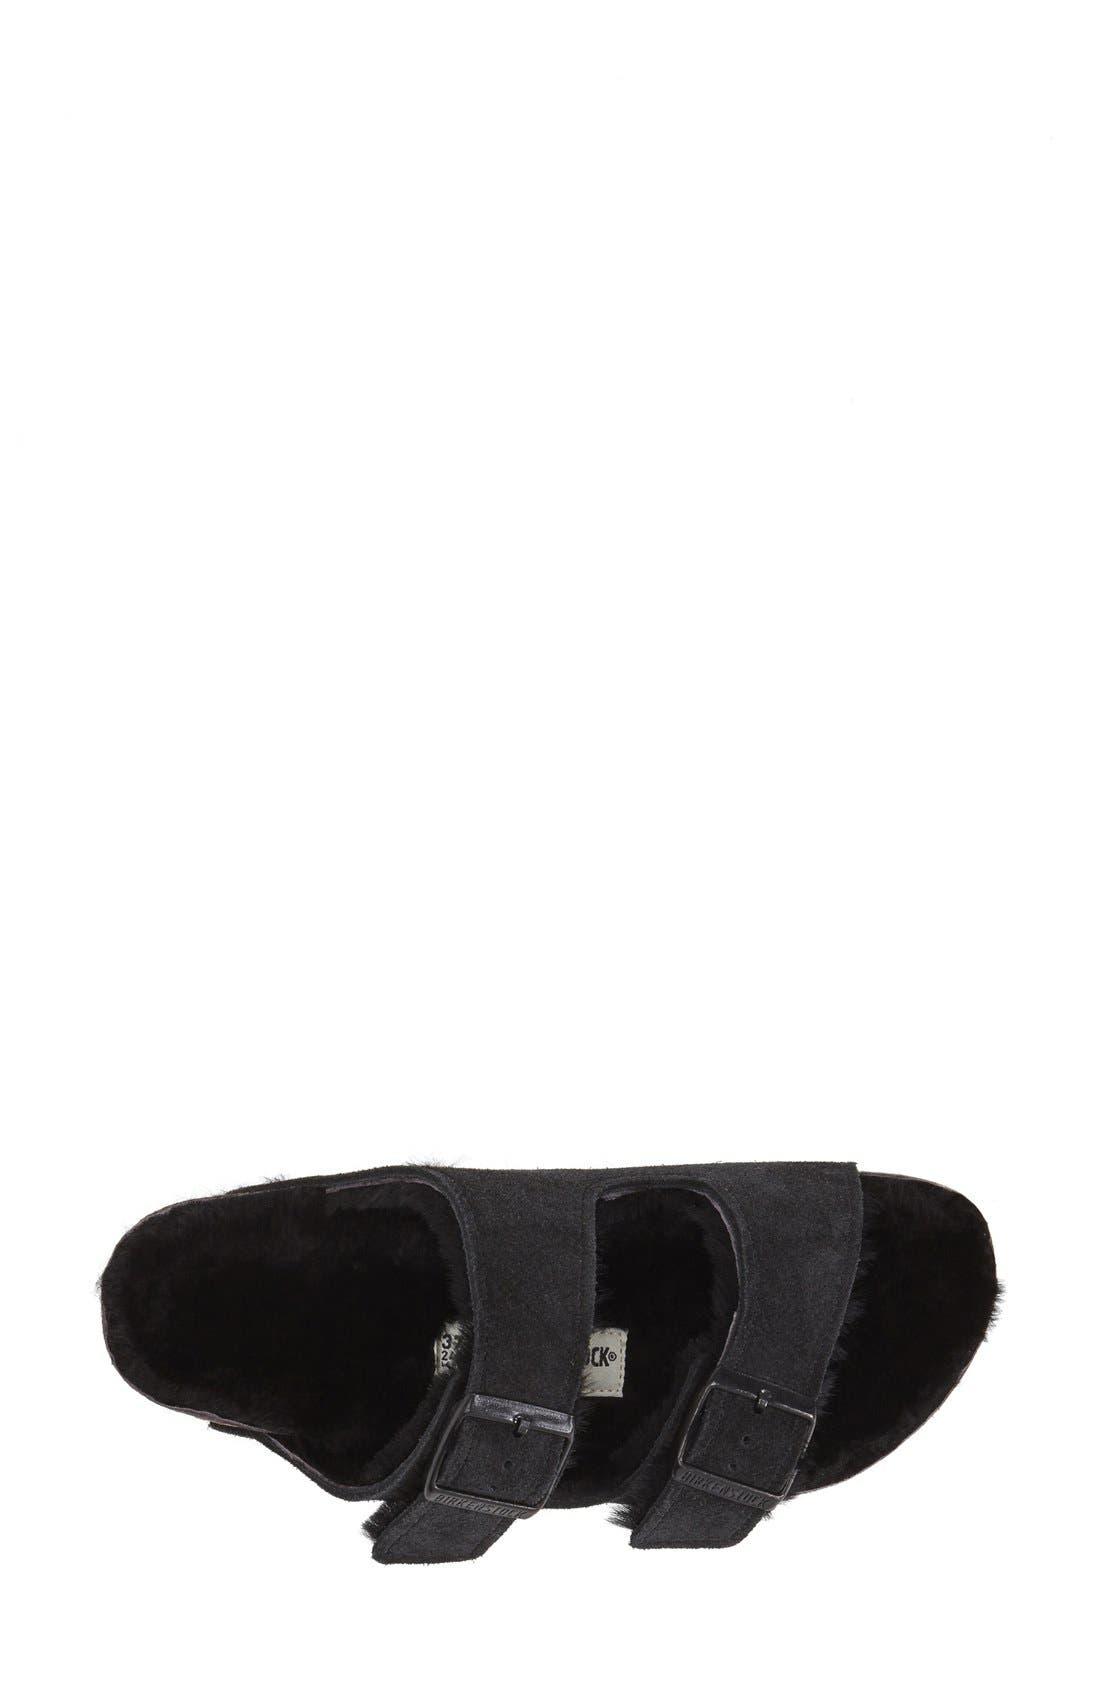 Alternate Image 3  - Birkenstock 'Arizona' Genuine Shearling Lined Sandal (Women)